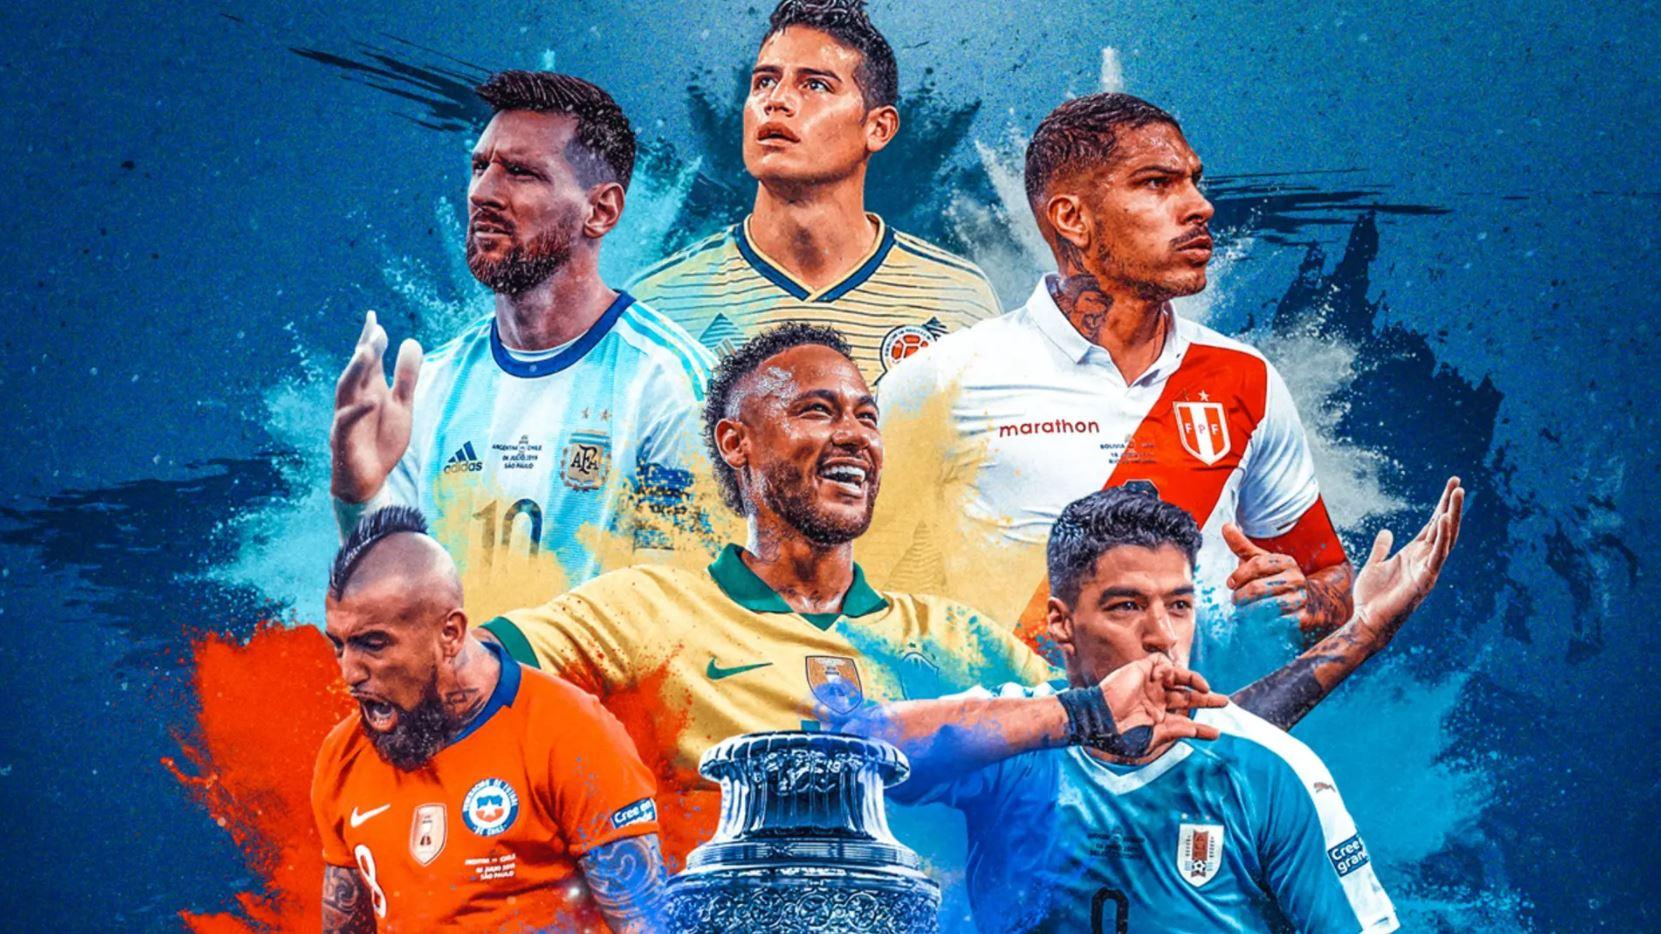 2021 Copa America winners format games finals